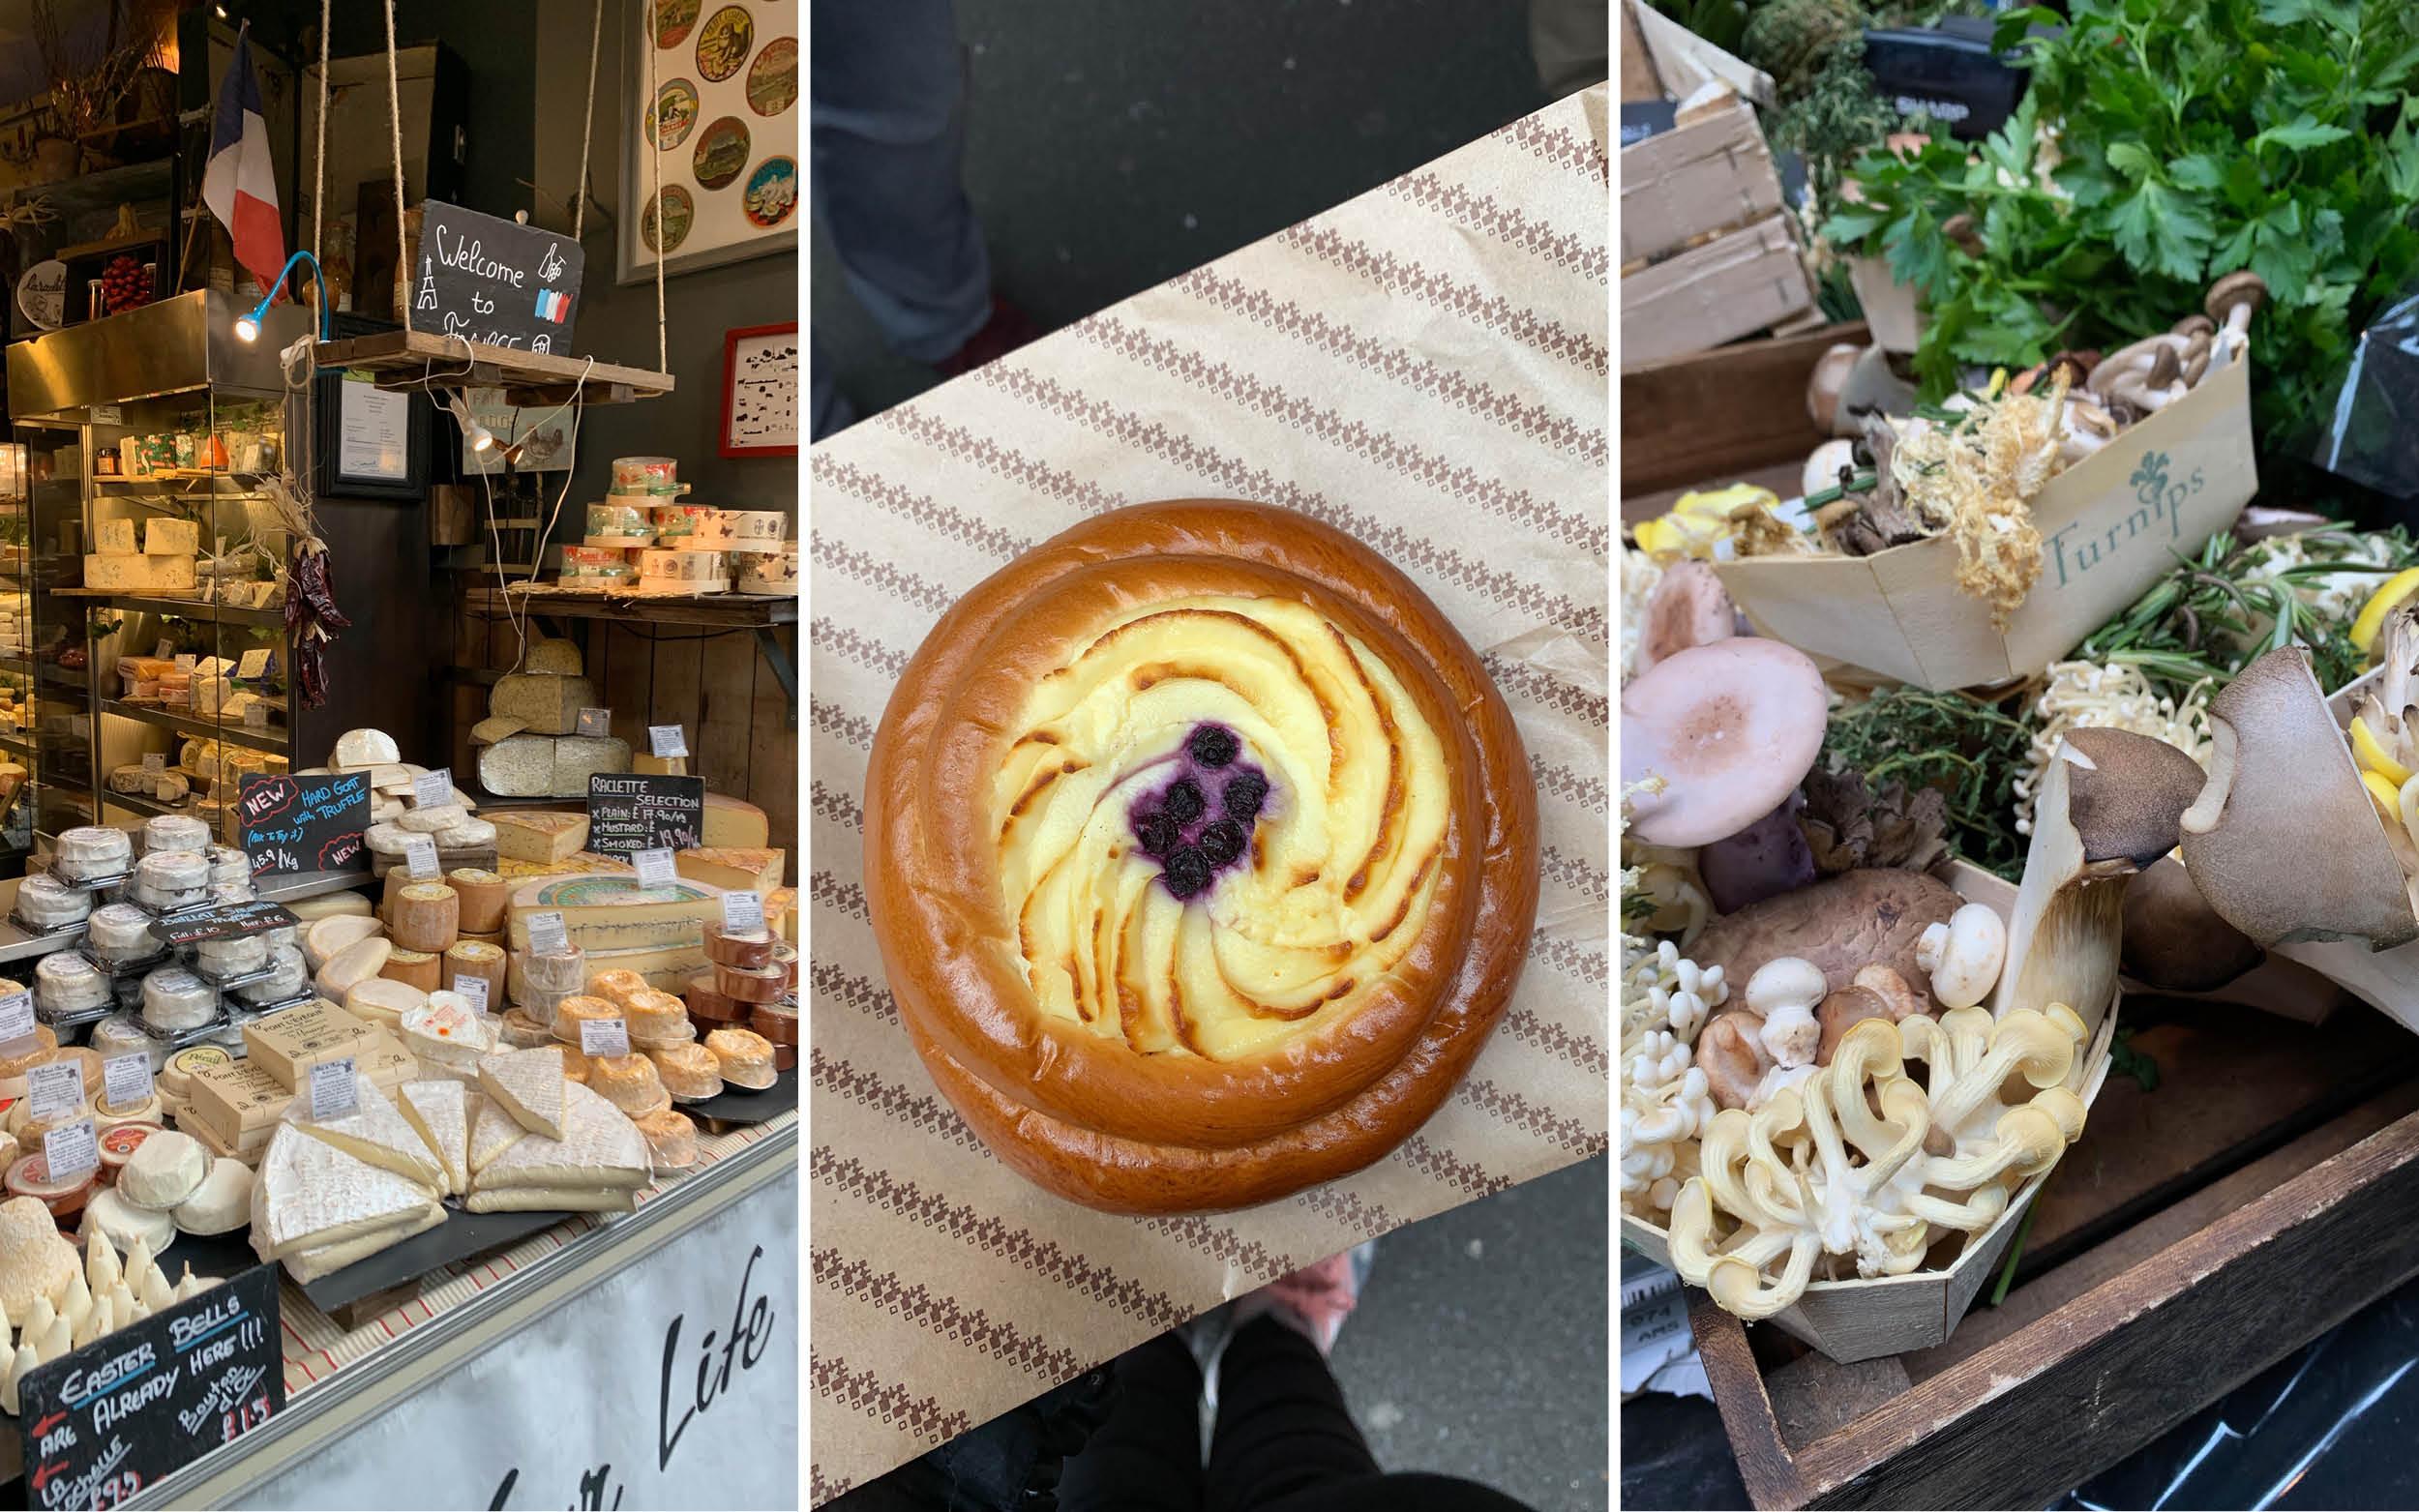 london-restaurant-tipps-borough-market-toertchen